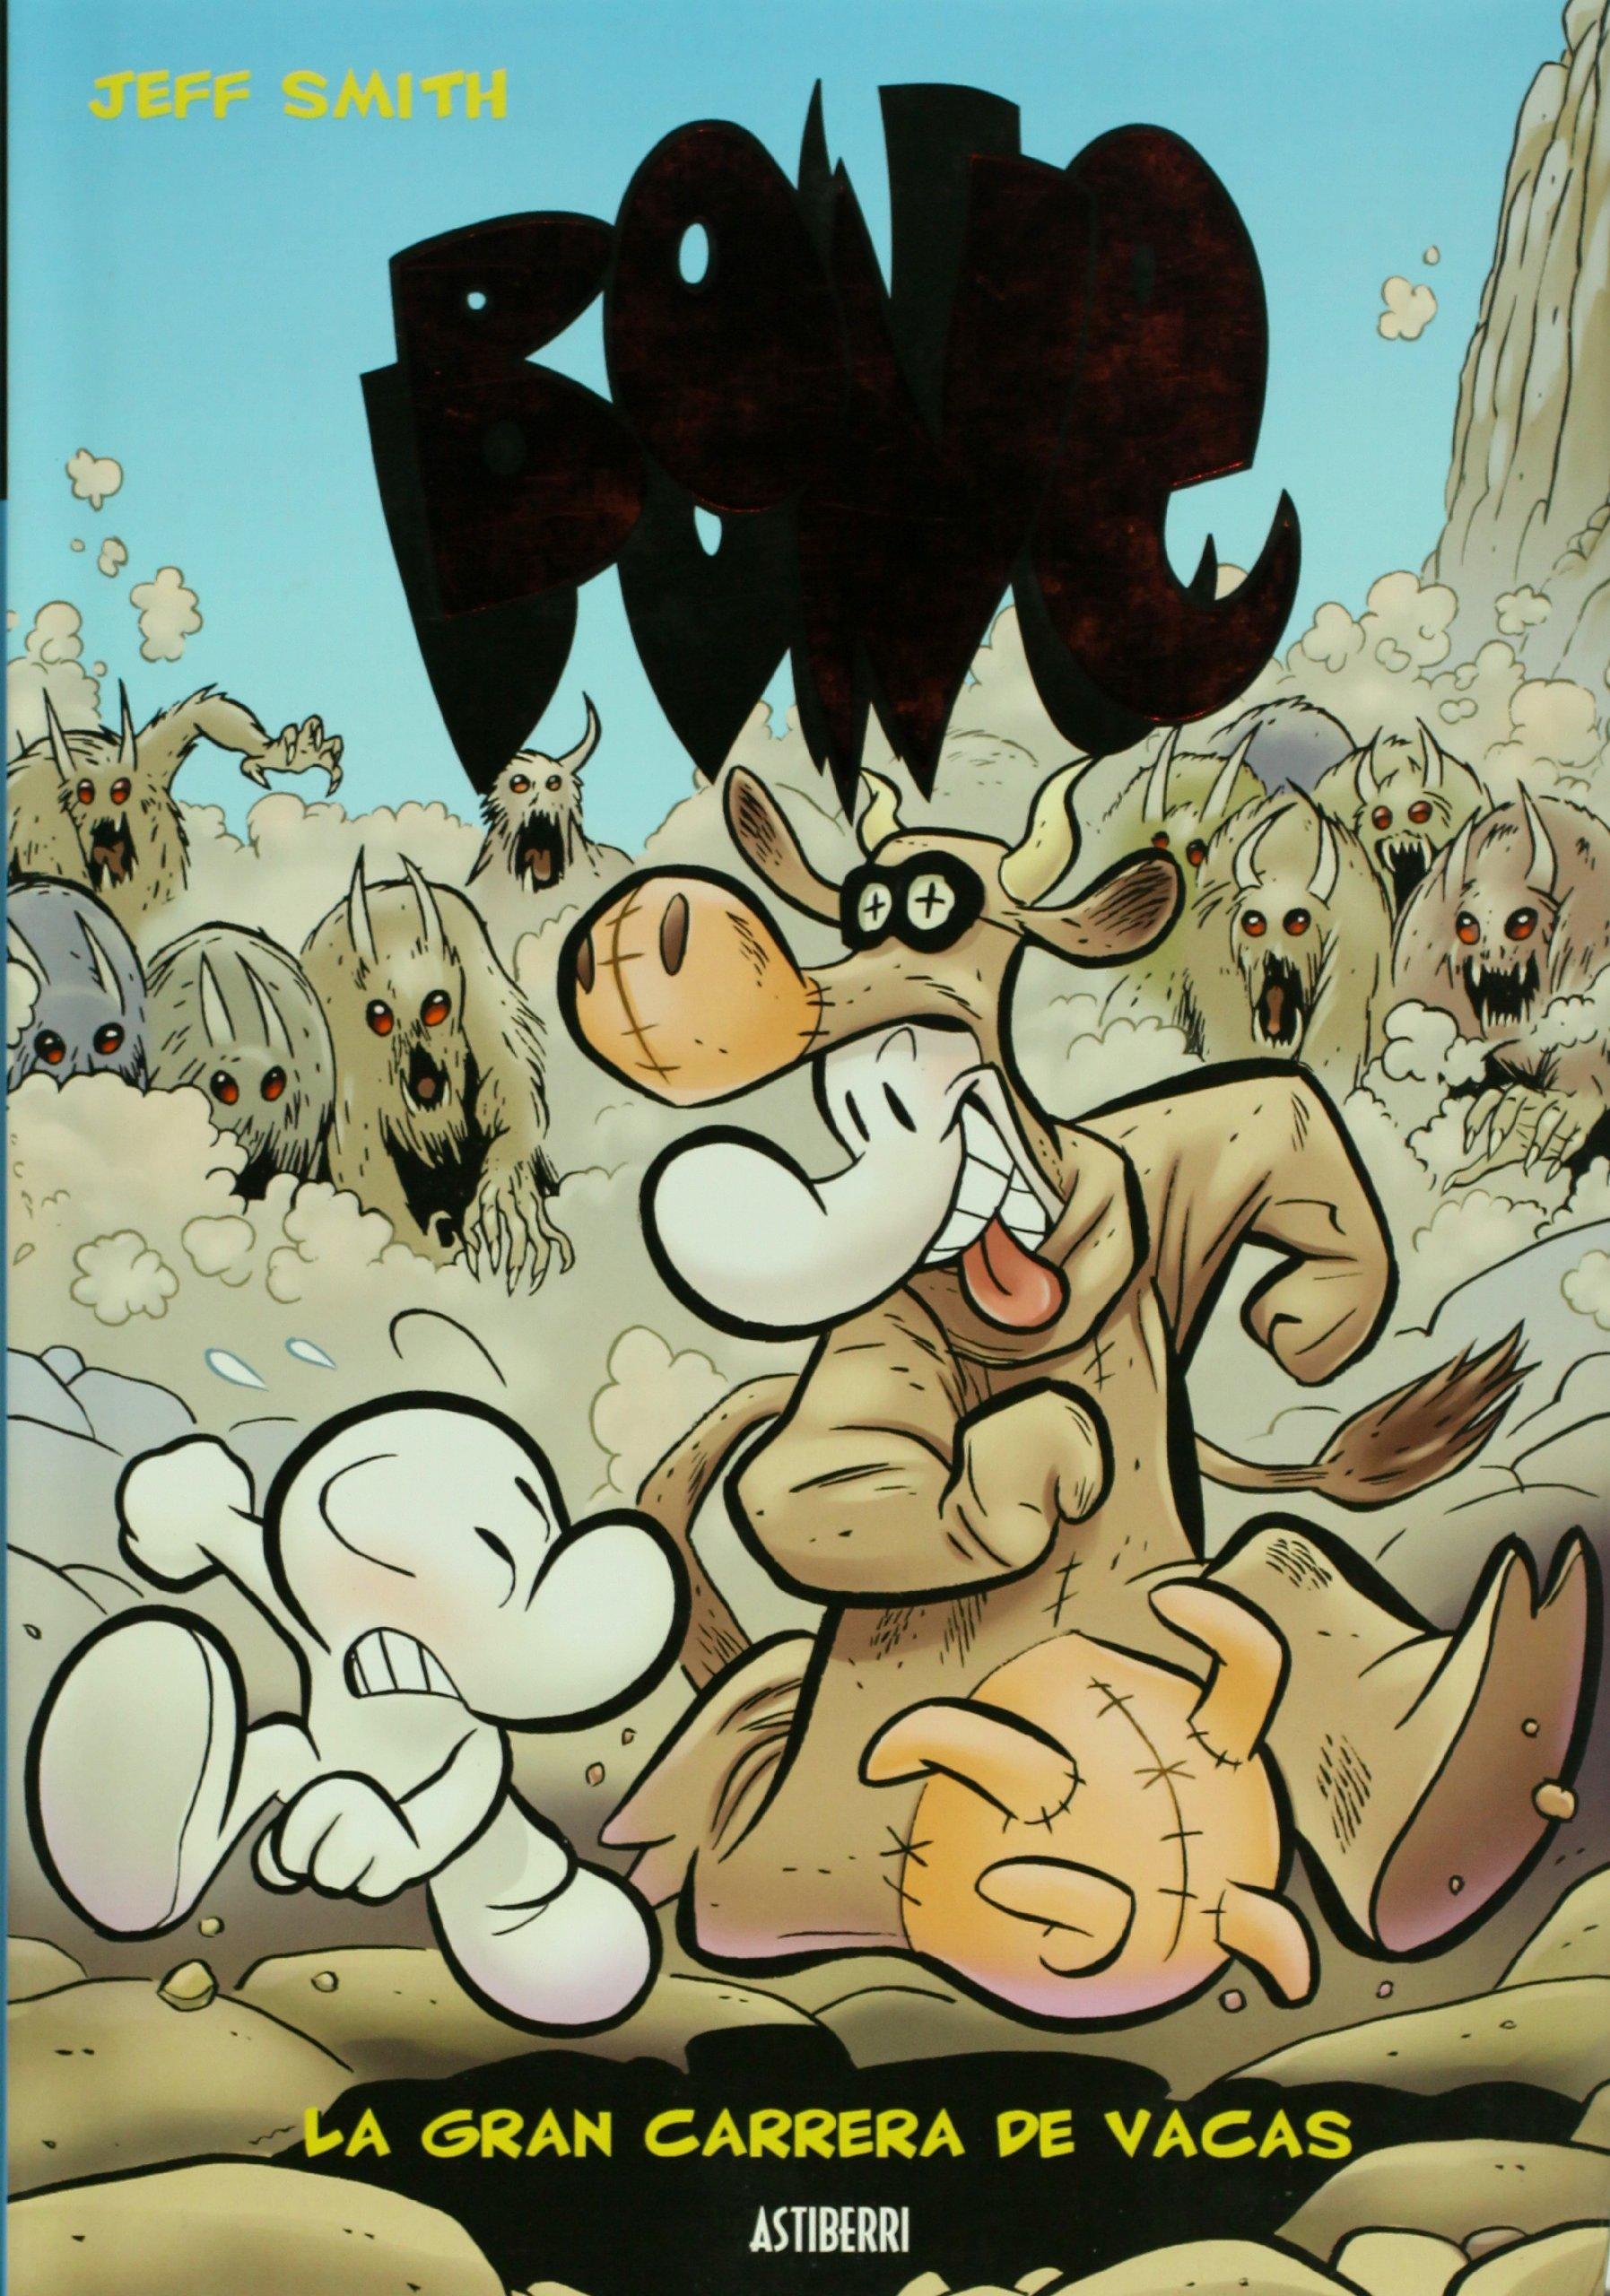 Bone 2 La Gran Carrera De Vacas Tapa dura – 1 mar 2010 Jeff Smith ASTIBERRI EDICIONES 8493538507 ASTBONEVOL2